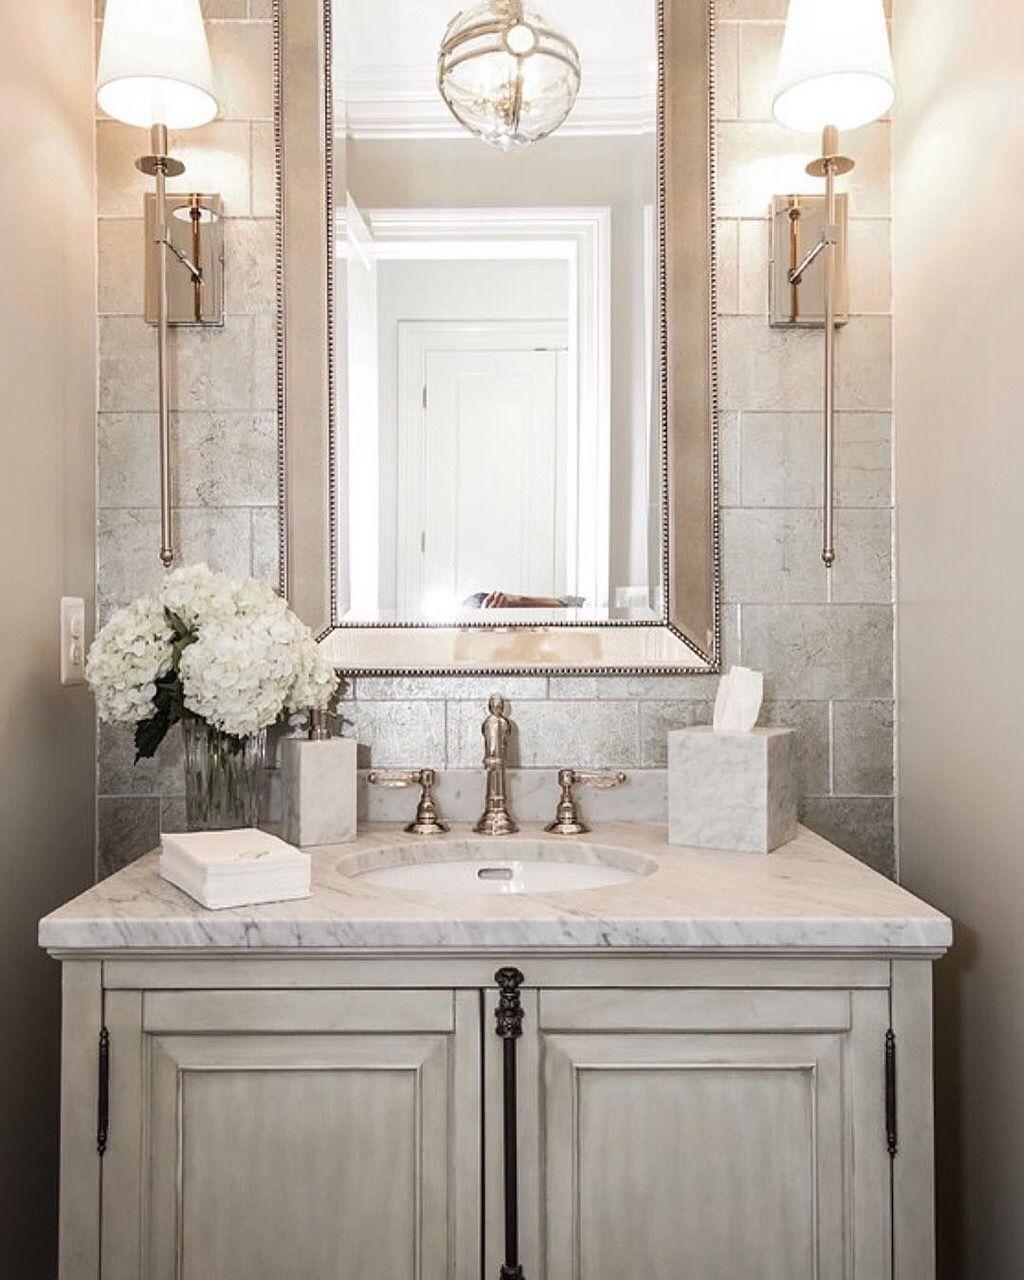 64b29da34d4505fe0de15abf908c9b41.jpg (1024×1280)   bathroom ideas ...